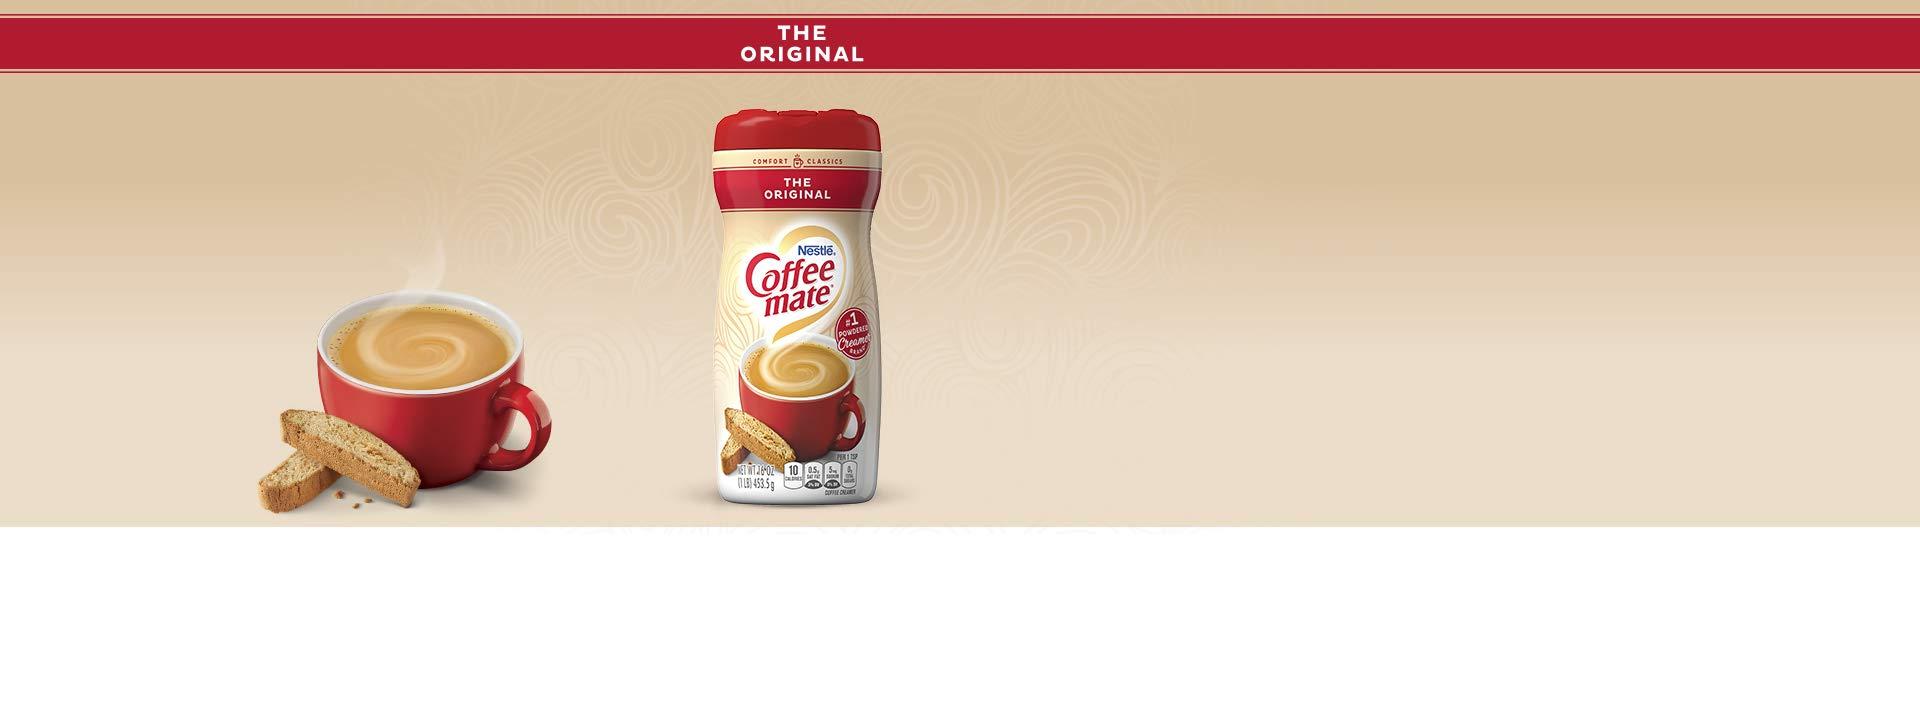 Nestle Coffee mate Coffee Creamer Original, Pack of 12 (16 Ounce) (11000443)